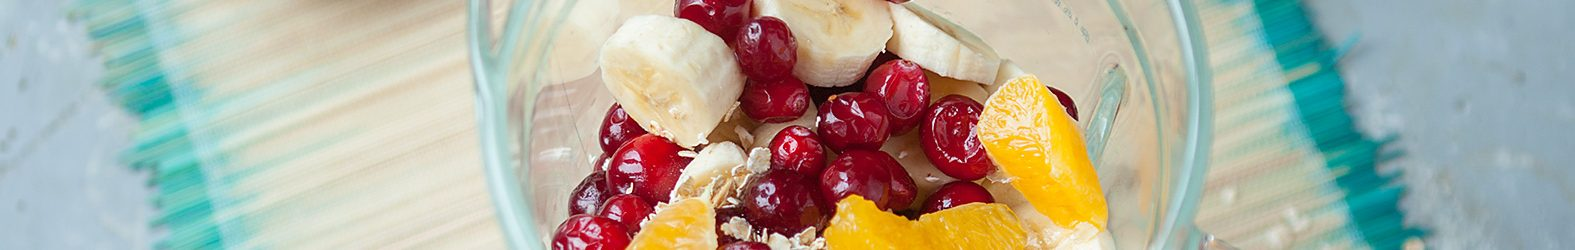 Havermoutsmoothie met cranberry's